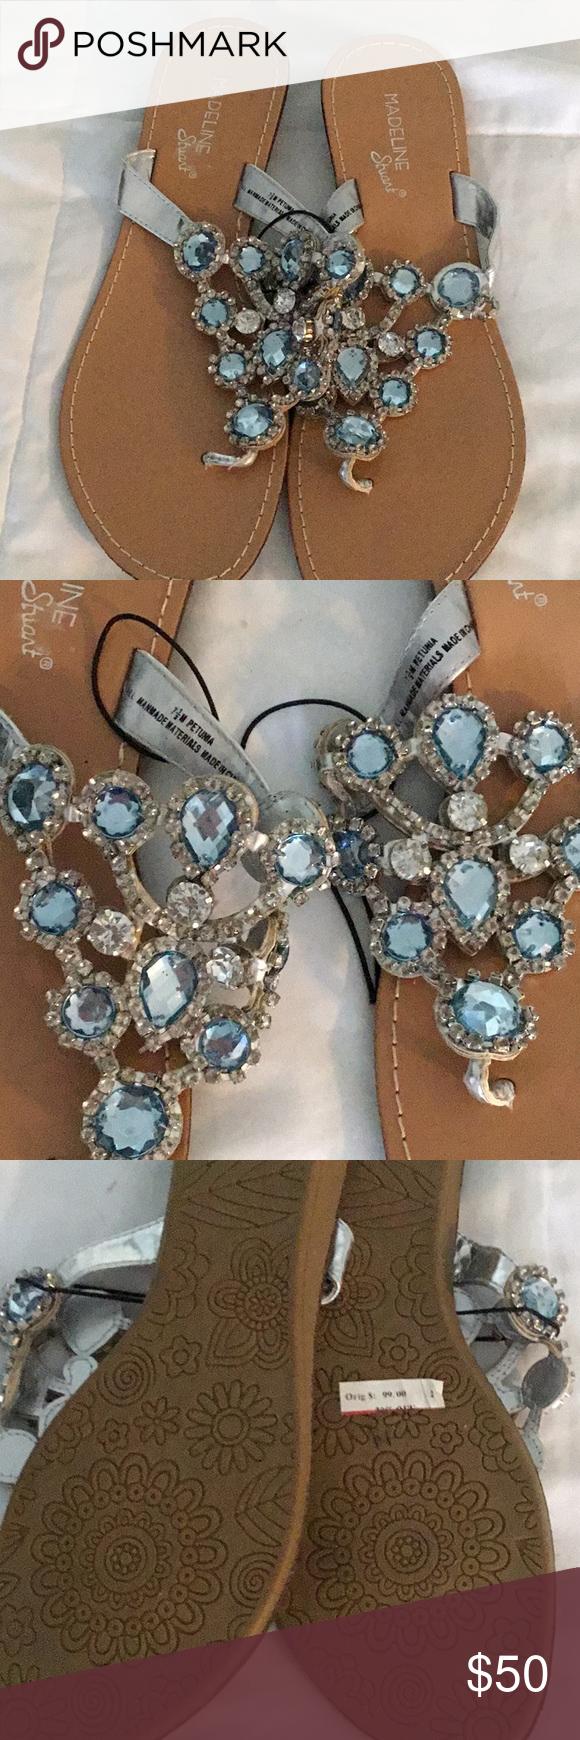 NEW Madeline Stuart jeweled sandals New Madeline Stuart sandals with blue stones and silver crystals Madeline Stuart Shoes